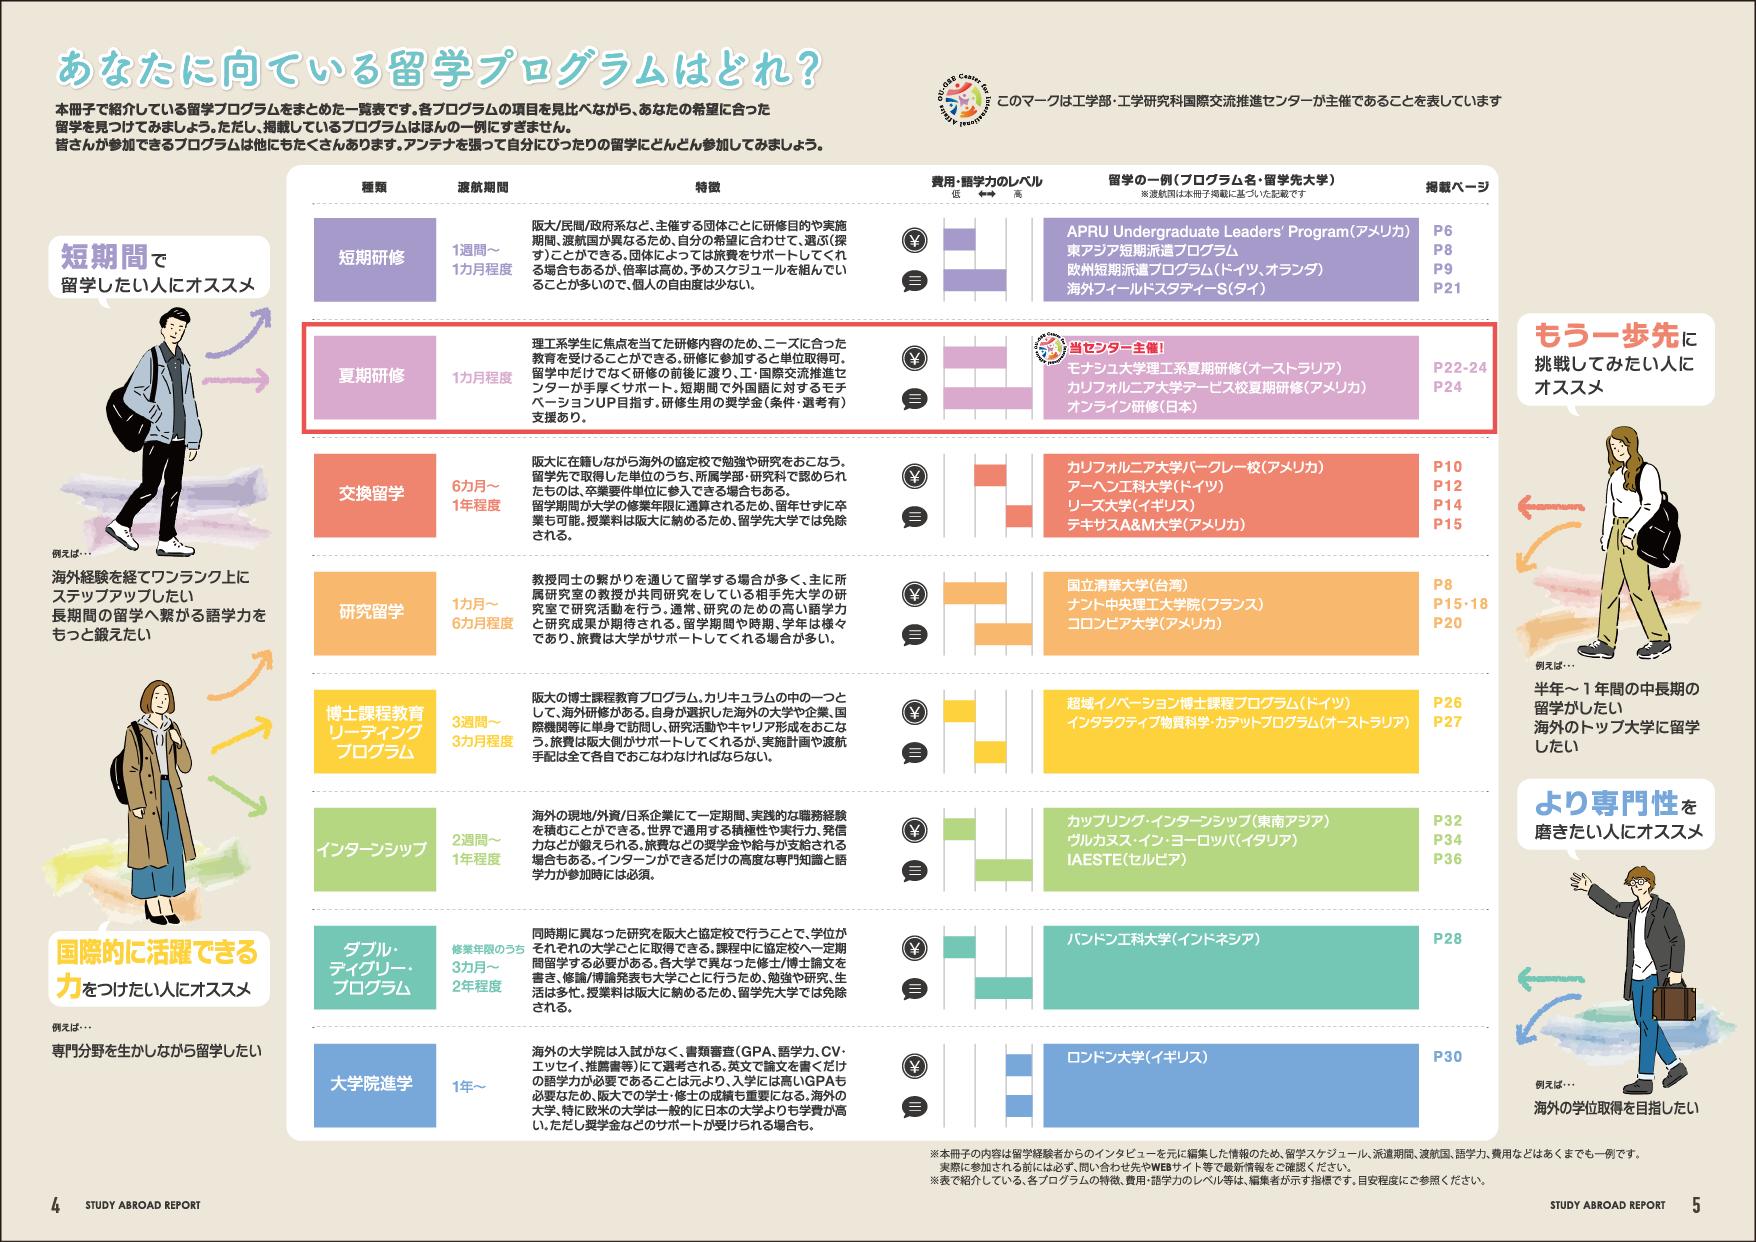 大阪大学大学院 工学研究科・工学部 国際交流推進センター様 海外留学体験談パンフレット・ロゴ